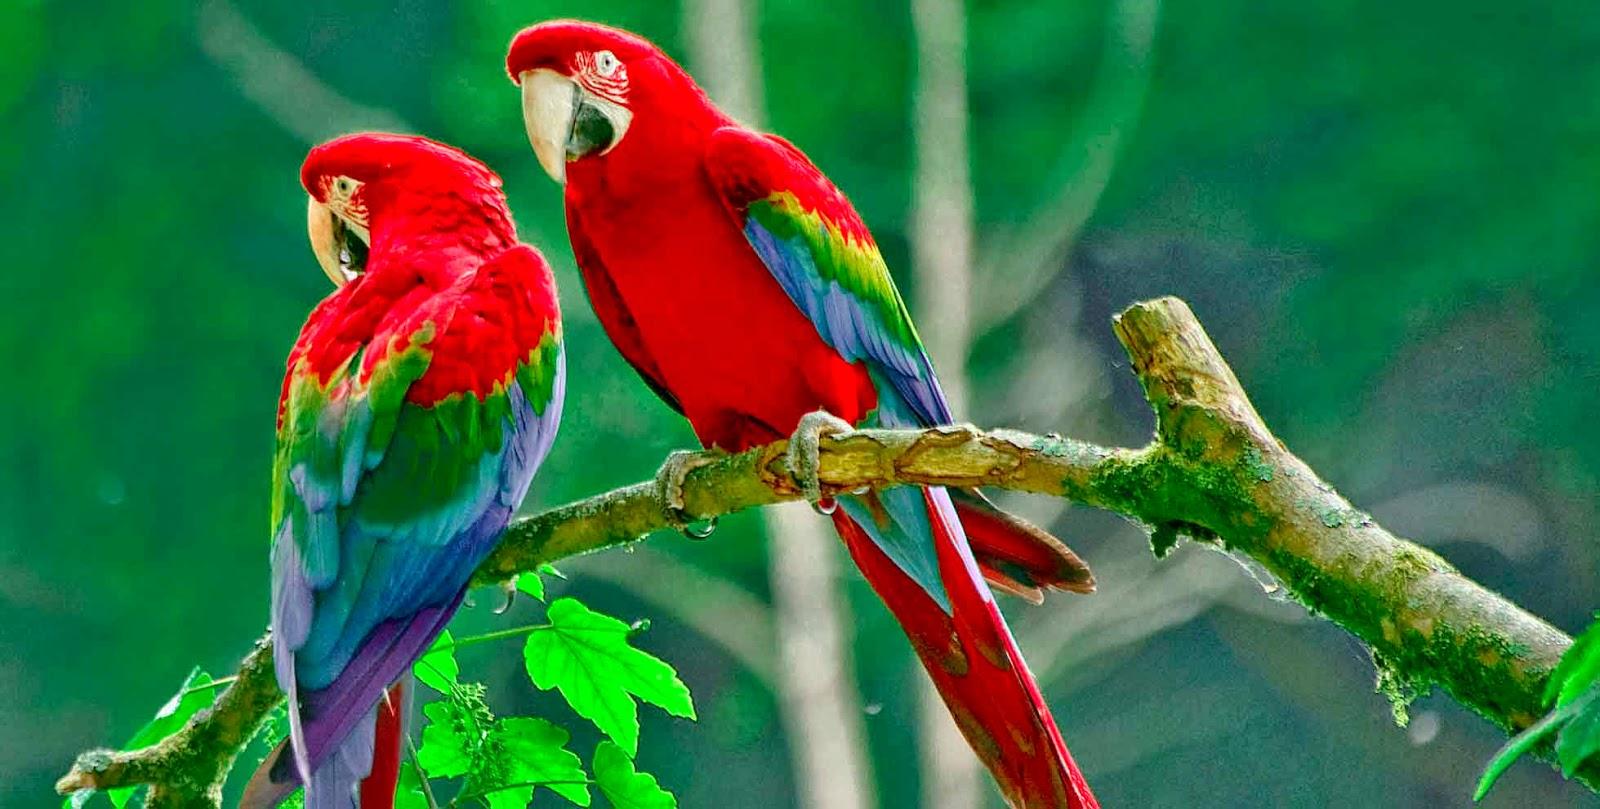 Birds of paradise wallpaper wallpapersafari - Hd images of birds of paradise ...